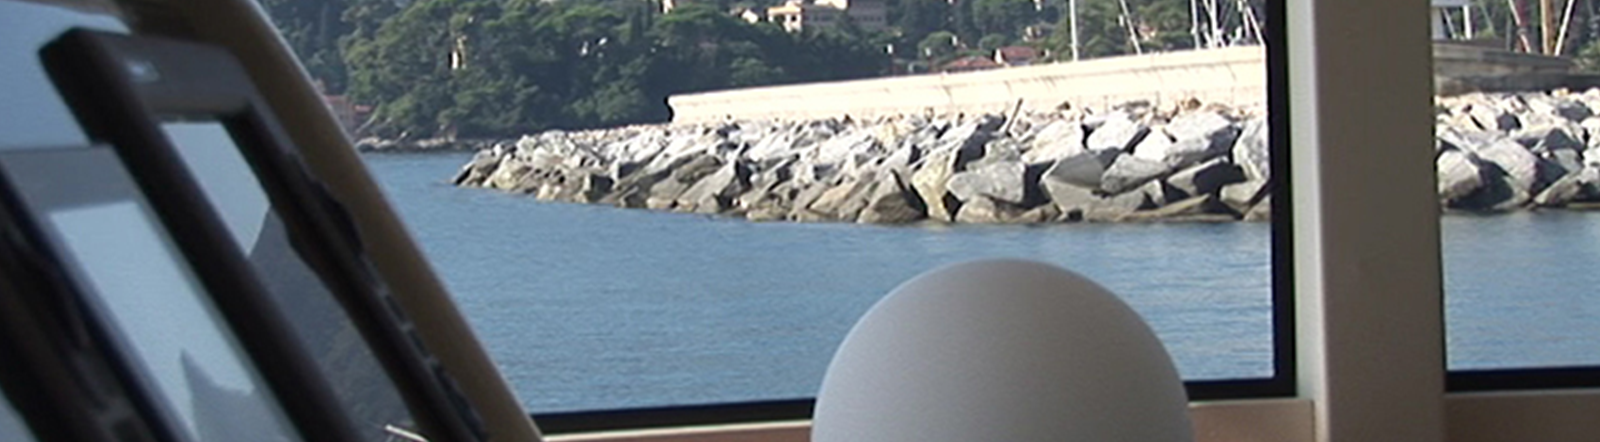 cruise learn.boatus.org banner